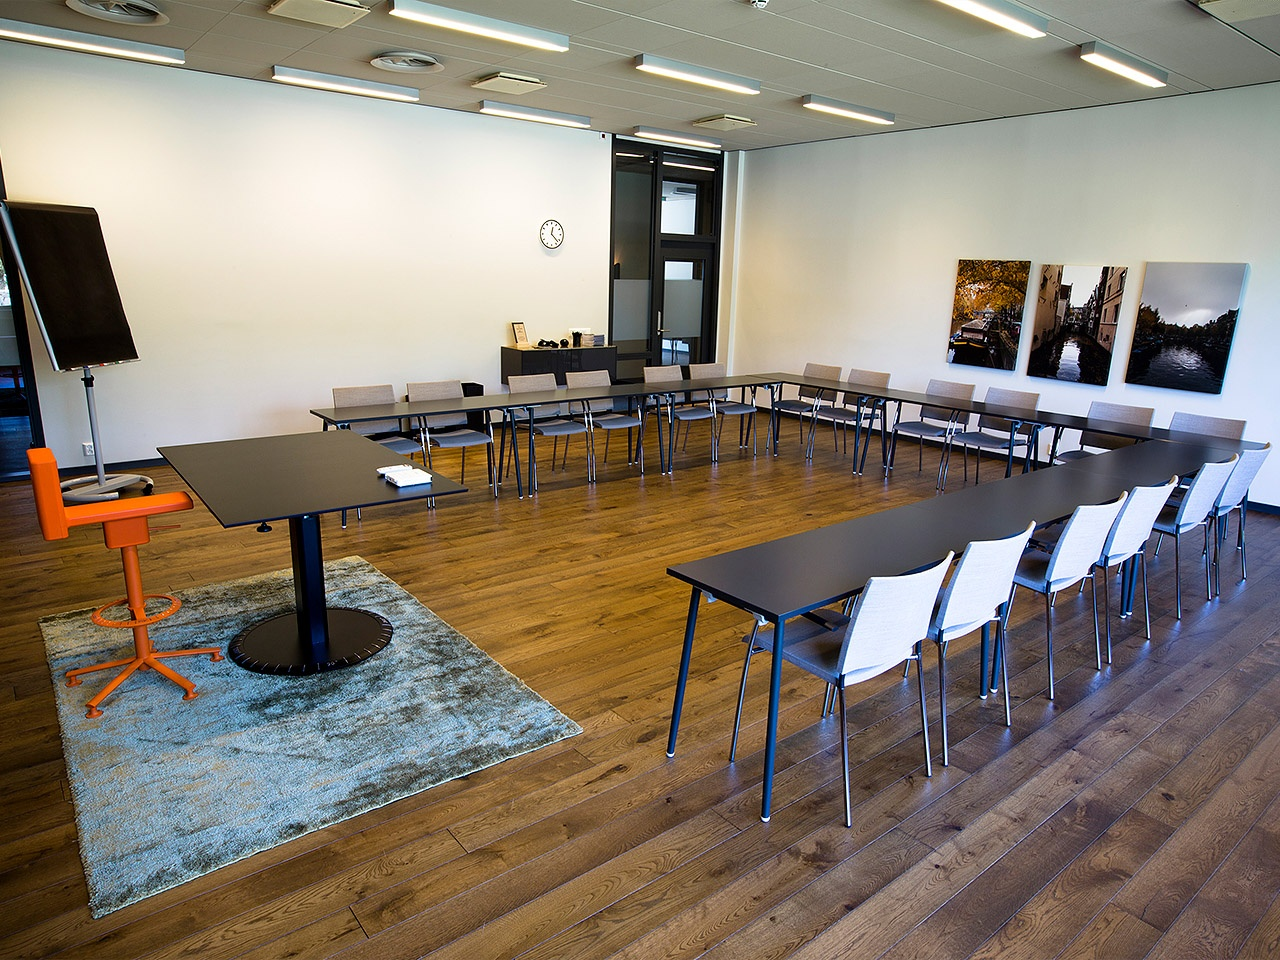 konferenslokal_amsterdam_sittning